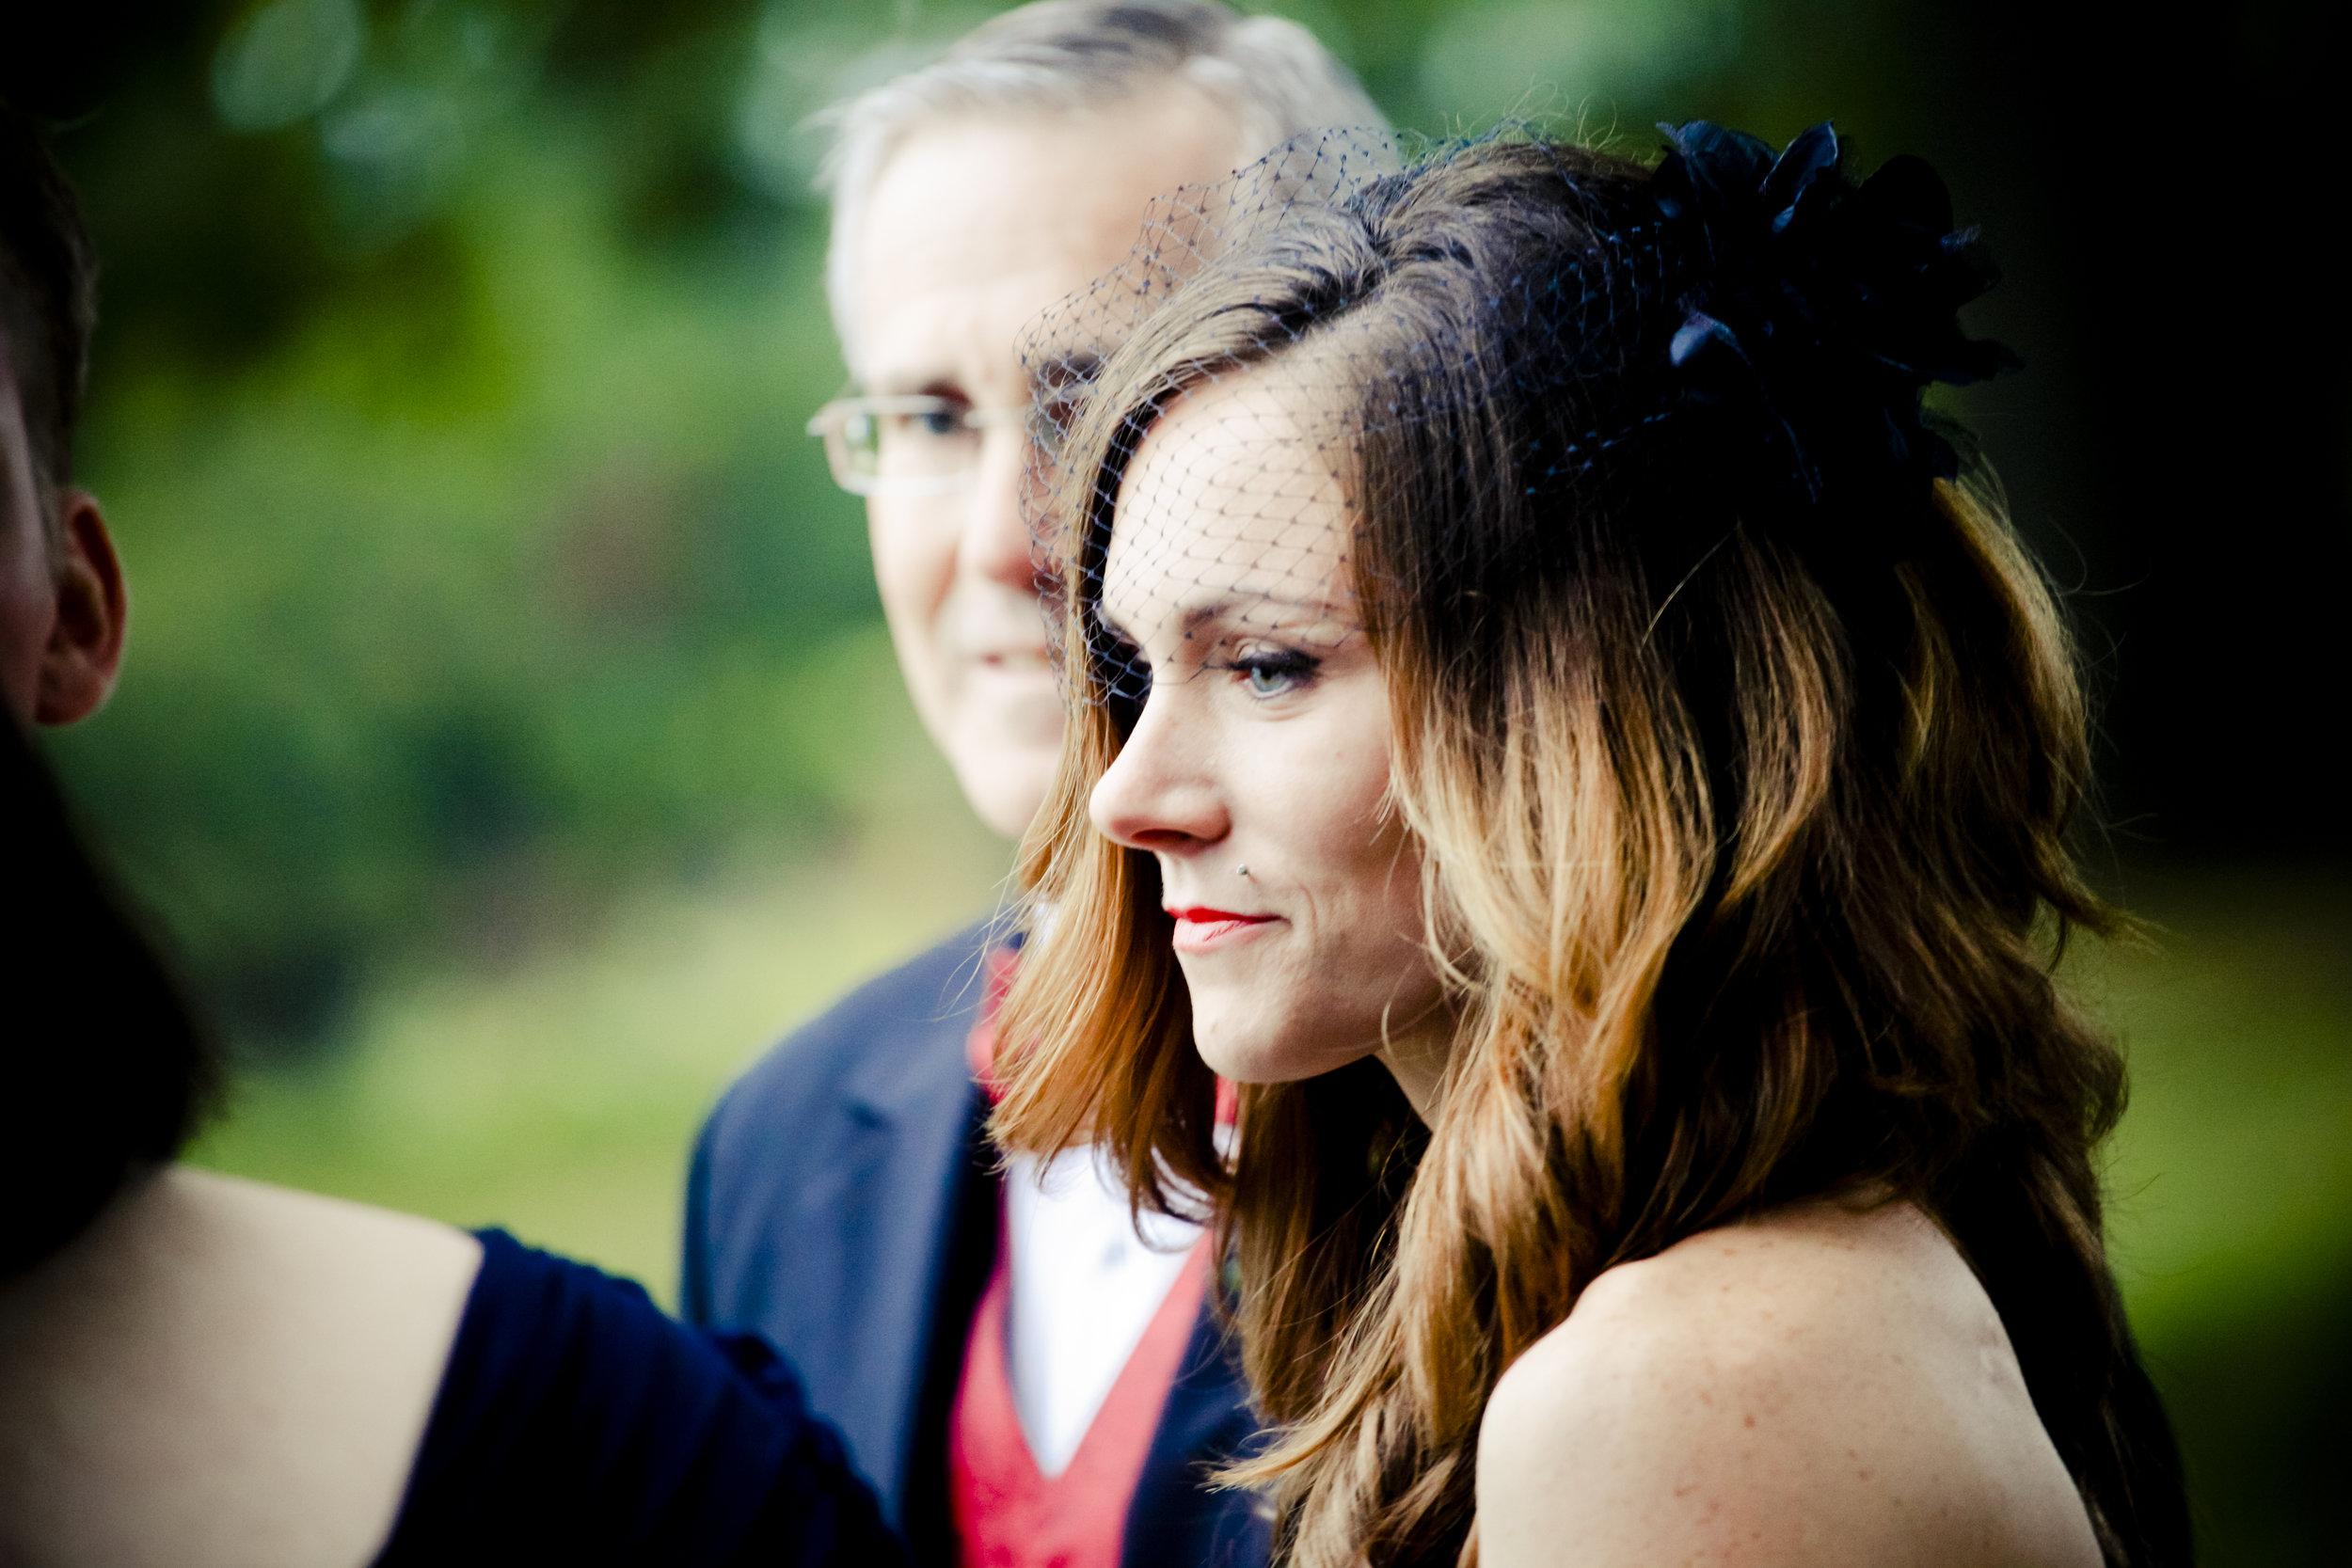 0012_100712 120 metcalf wedding edited.JPG